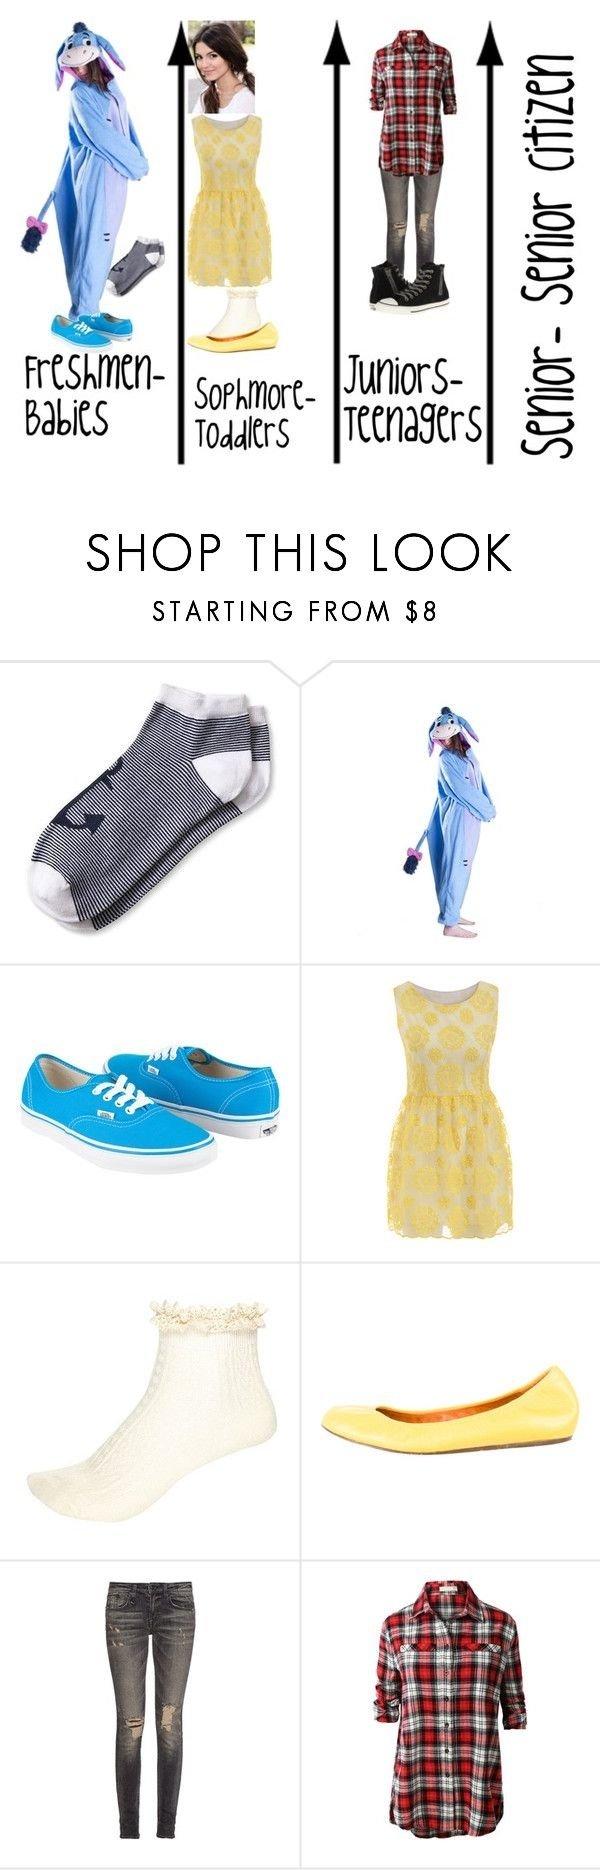 10 Gorgeous Spirit Days Ideas For High School 8 best spirit week ideas images on pinterest spirit week themes 2021